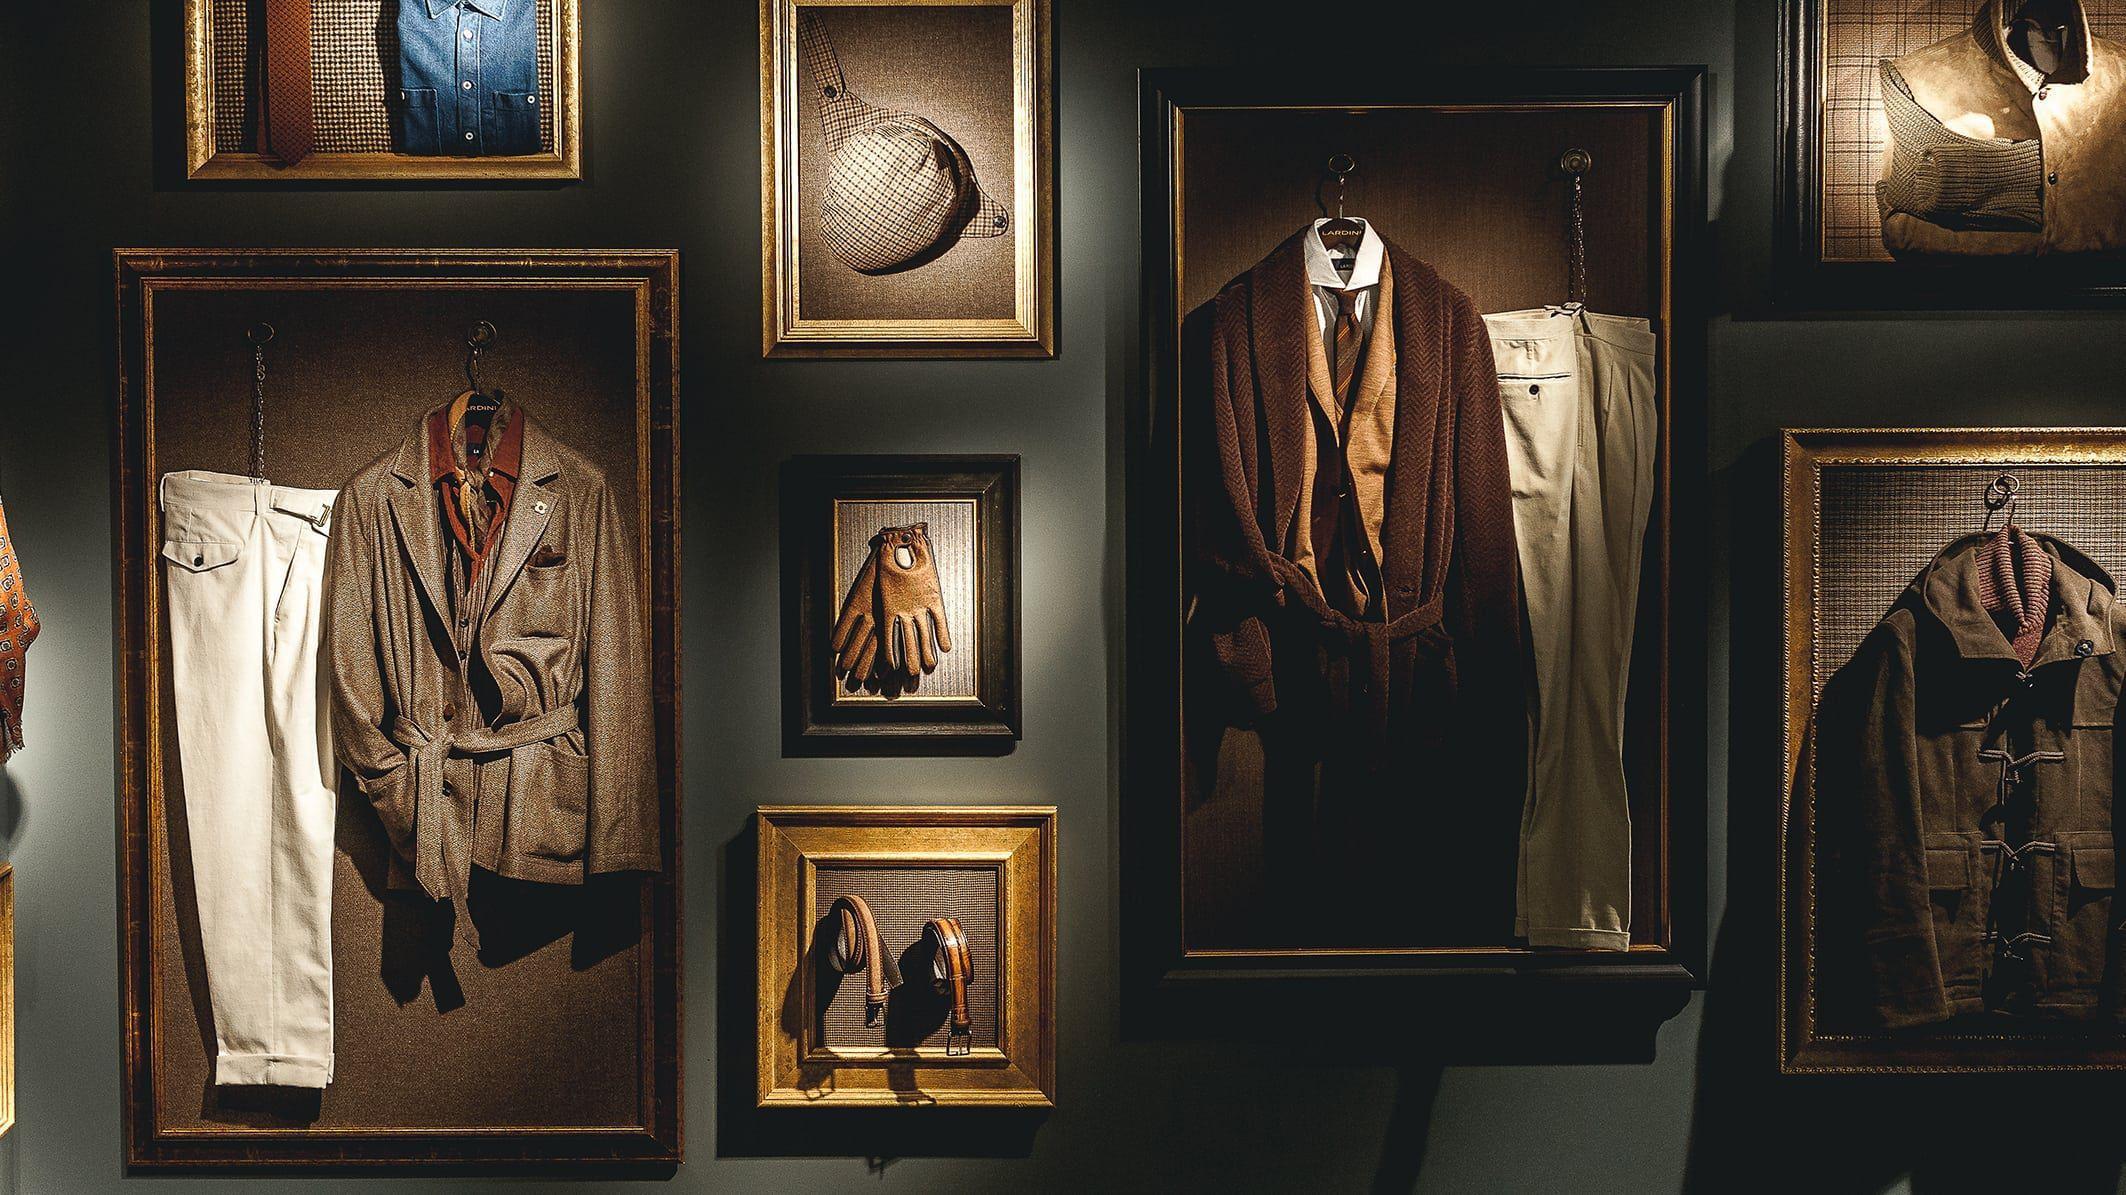 Lardini Showroom at Pitti Uomo 93